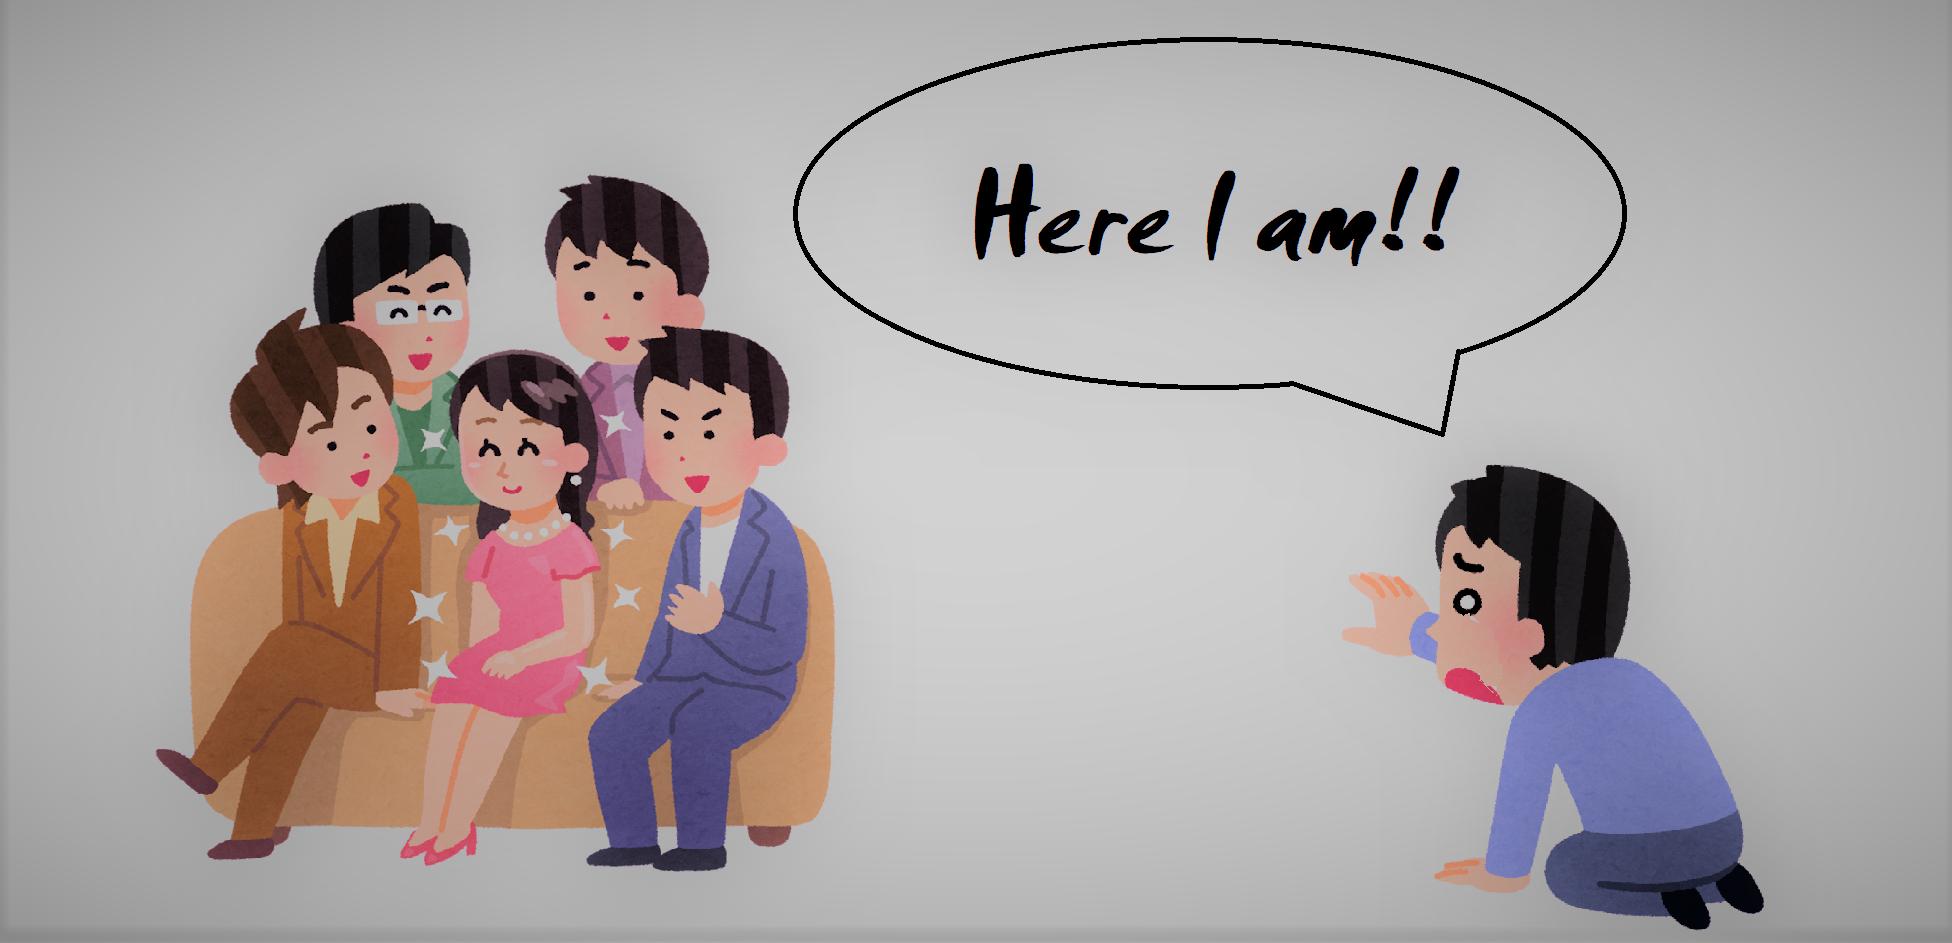 「Here I am!!」のイメージ